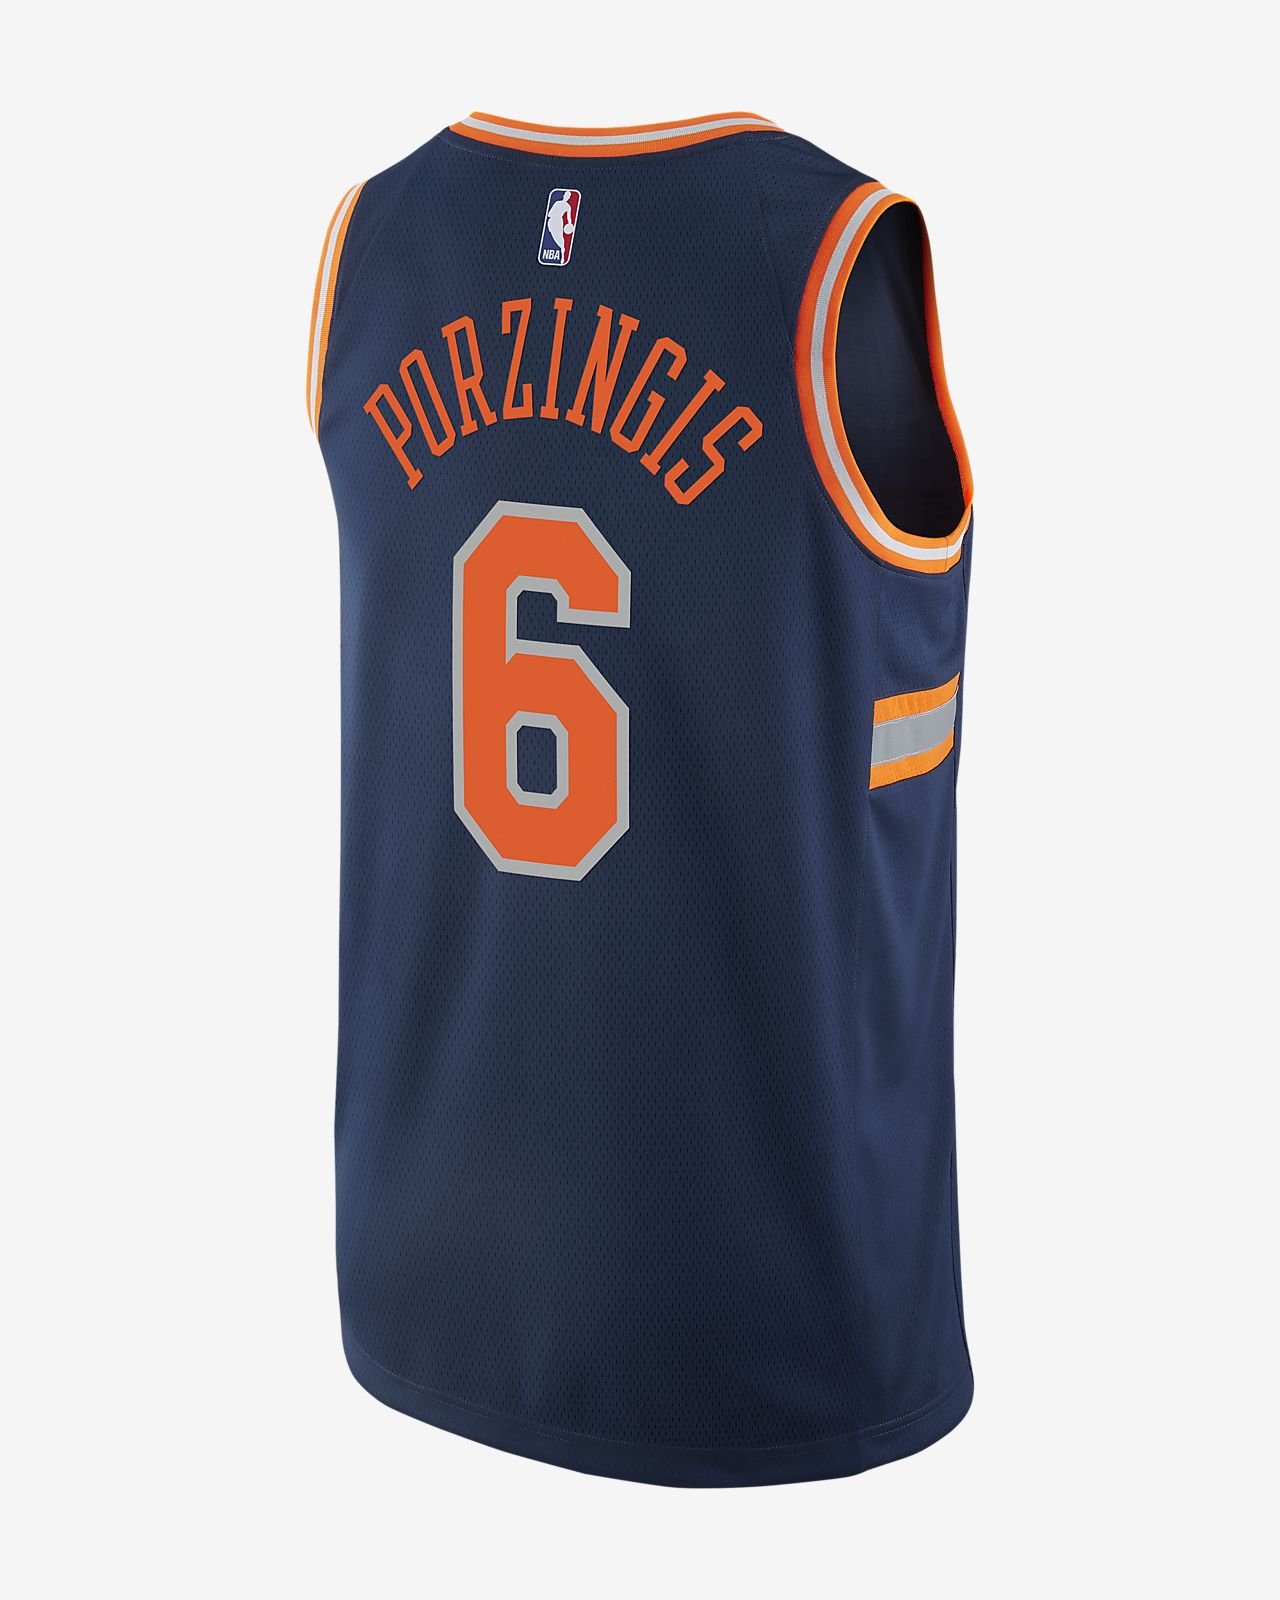 0c54b2d7d ... kristaps porzingis city edition swingman jersey (new york knicks) mens  nike nba jersey